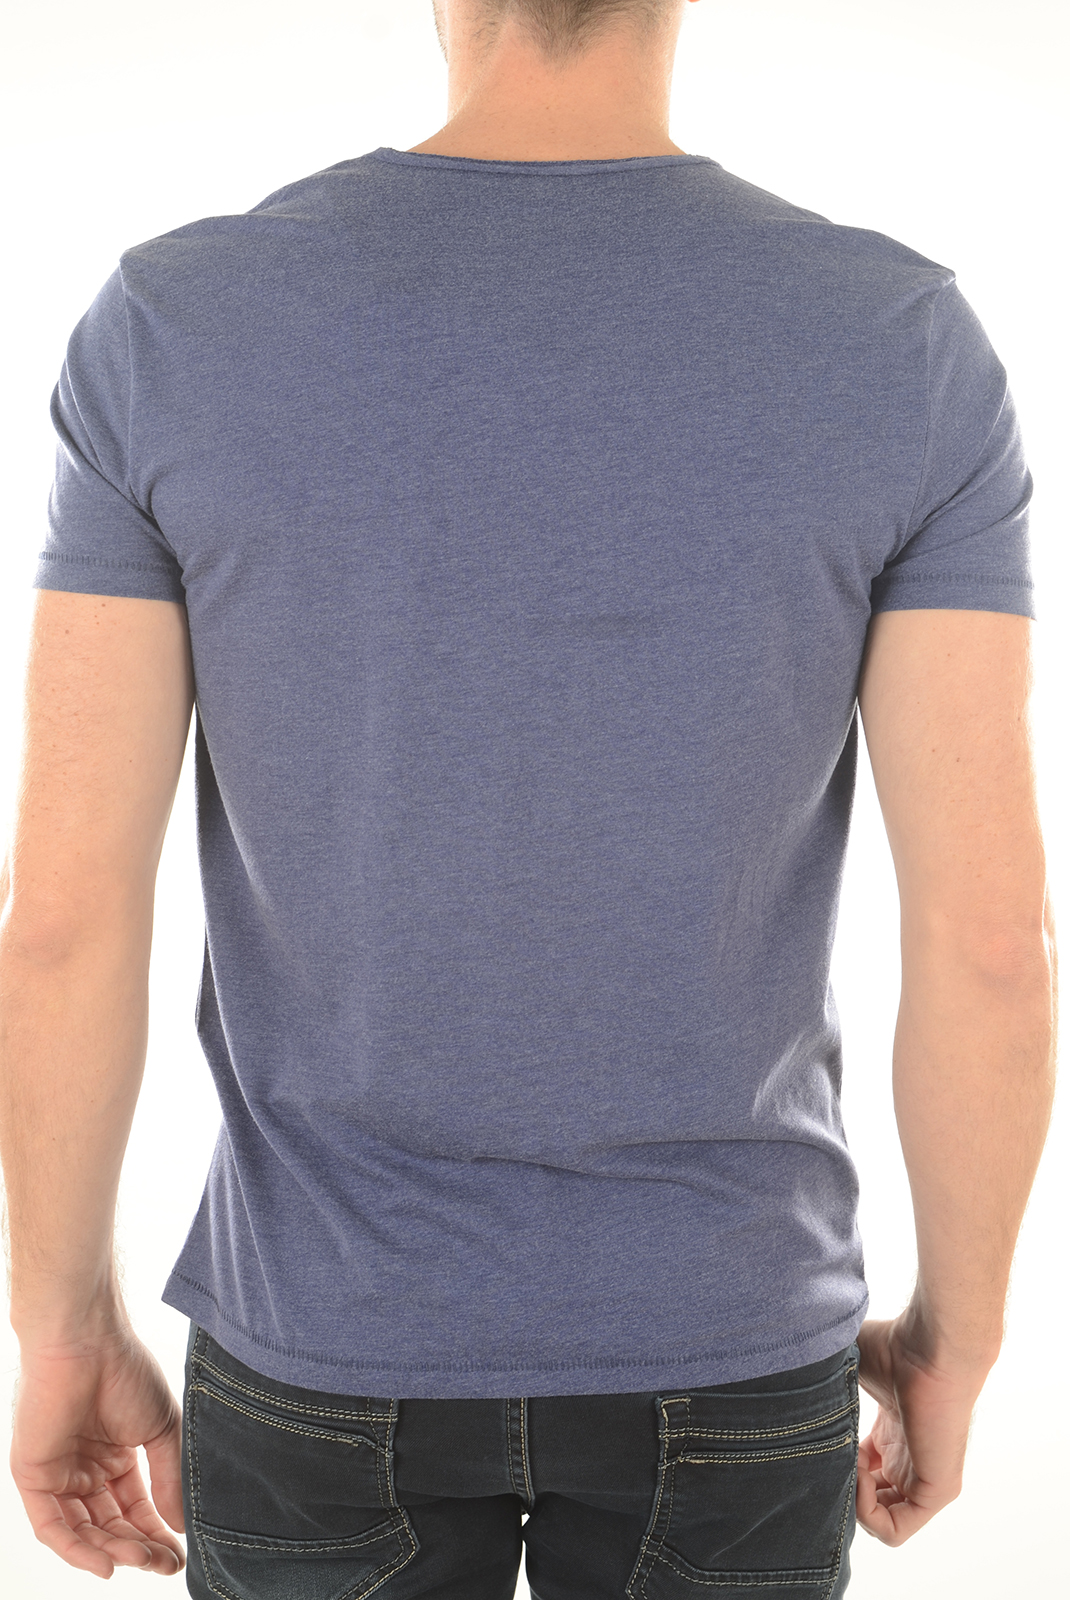 Tee-shirts  Kaporal SALVA E17 PATRIOT